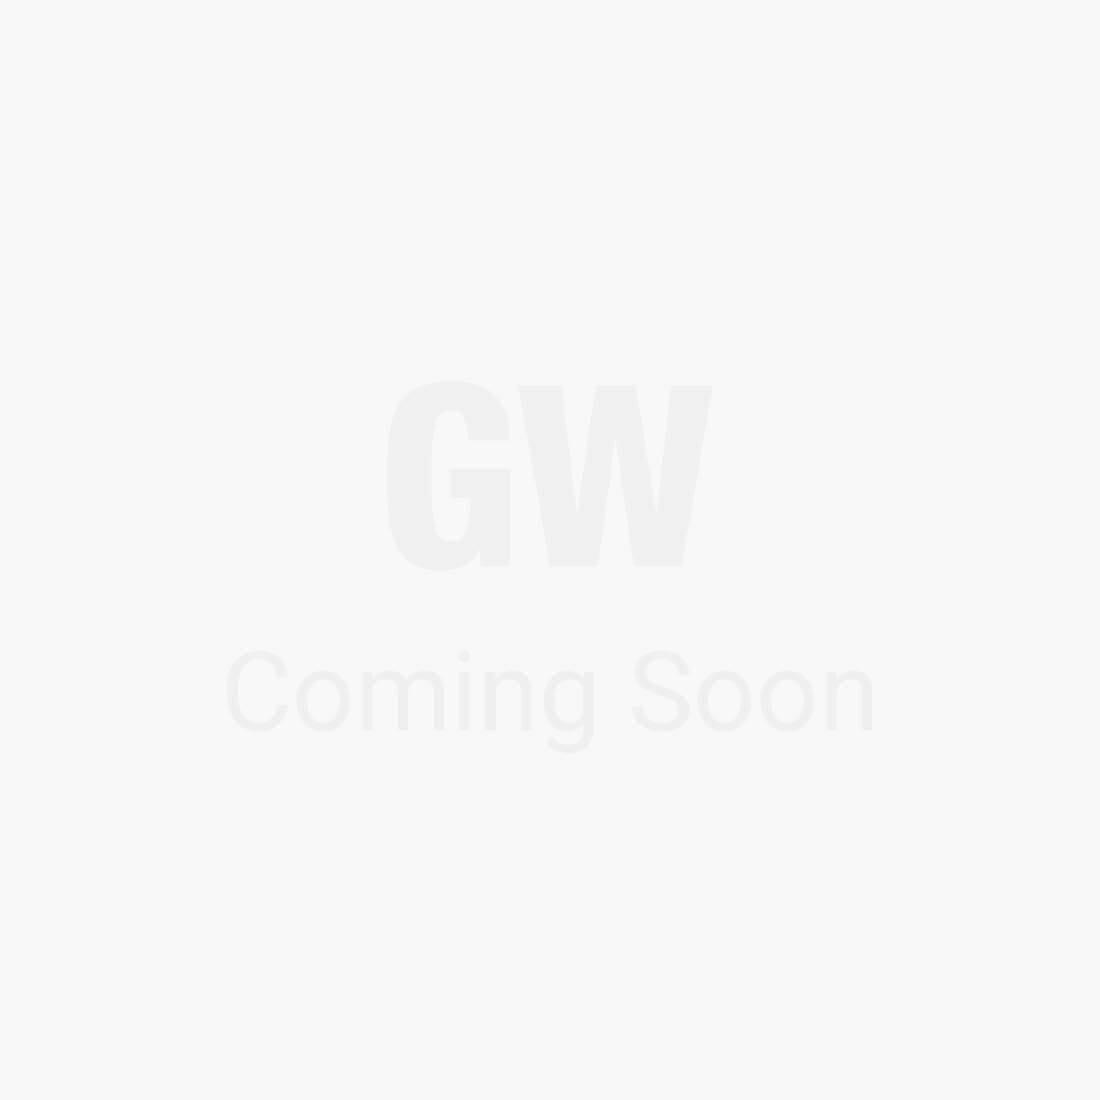 Mason Round Coffee Tables